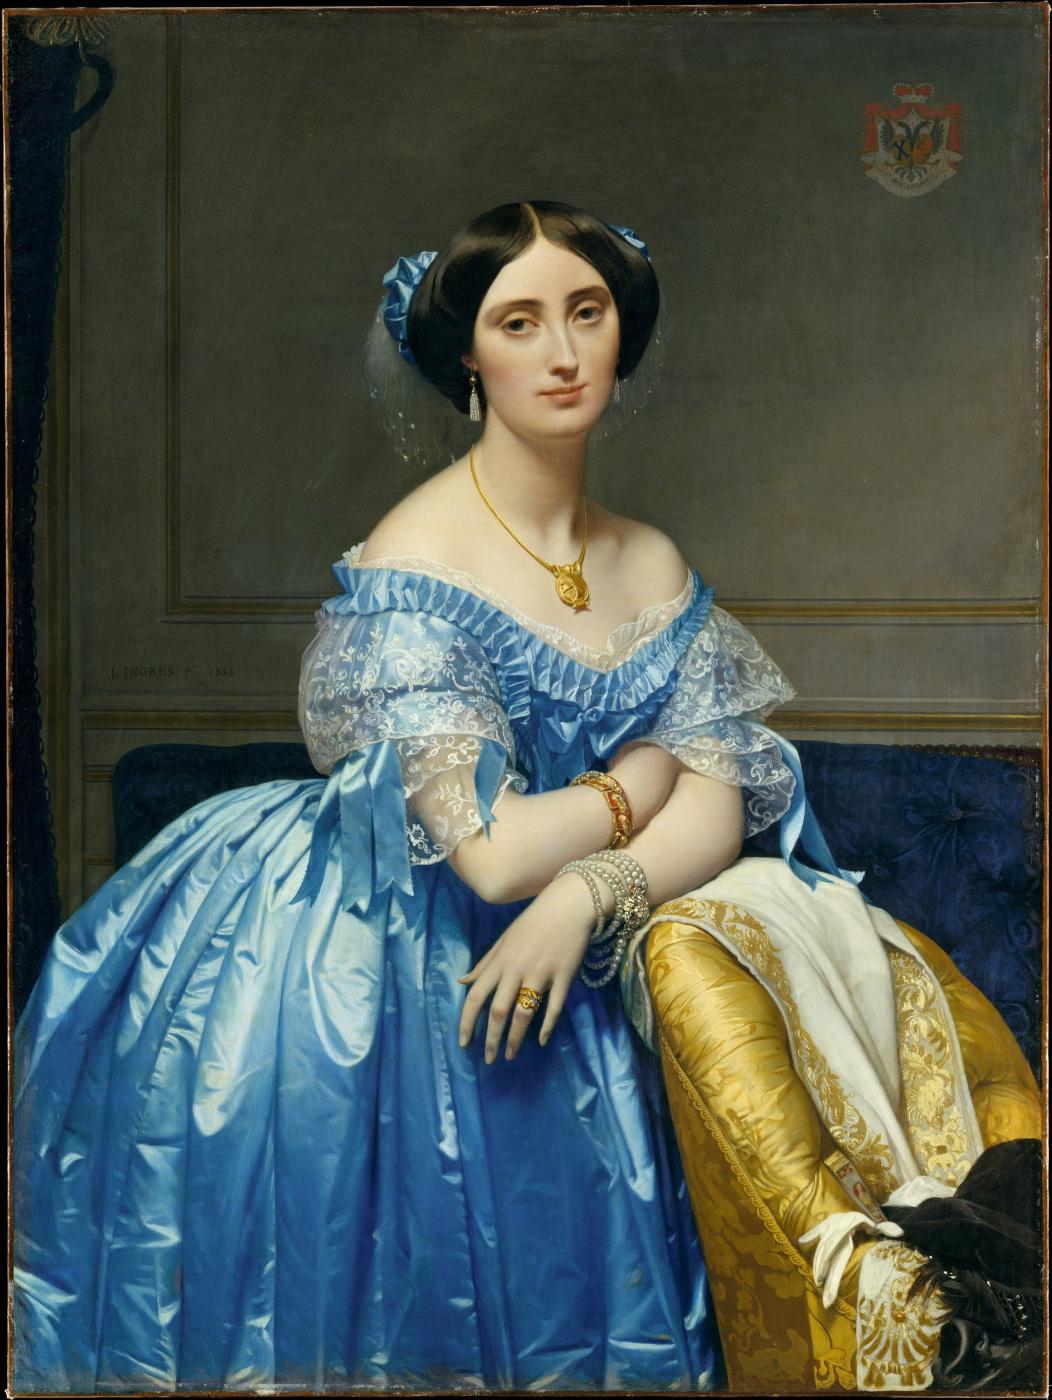 Jean Auguste Dominique Ingres. Josephine-Eleanor-Marie-Pauline de Galard Brassac de Bearn, Duchess of Broglie